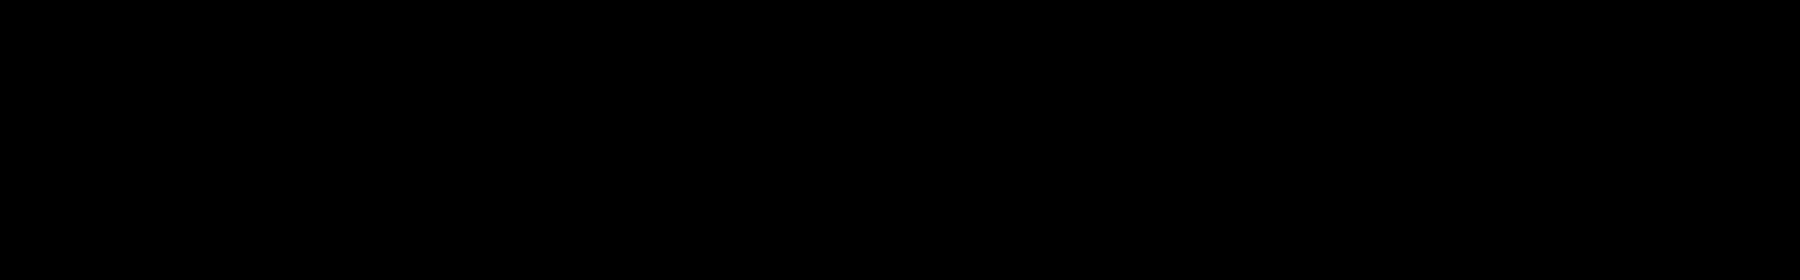 Elysian audio waveform